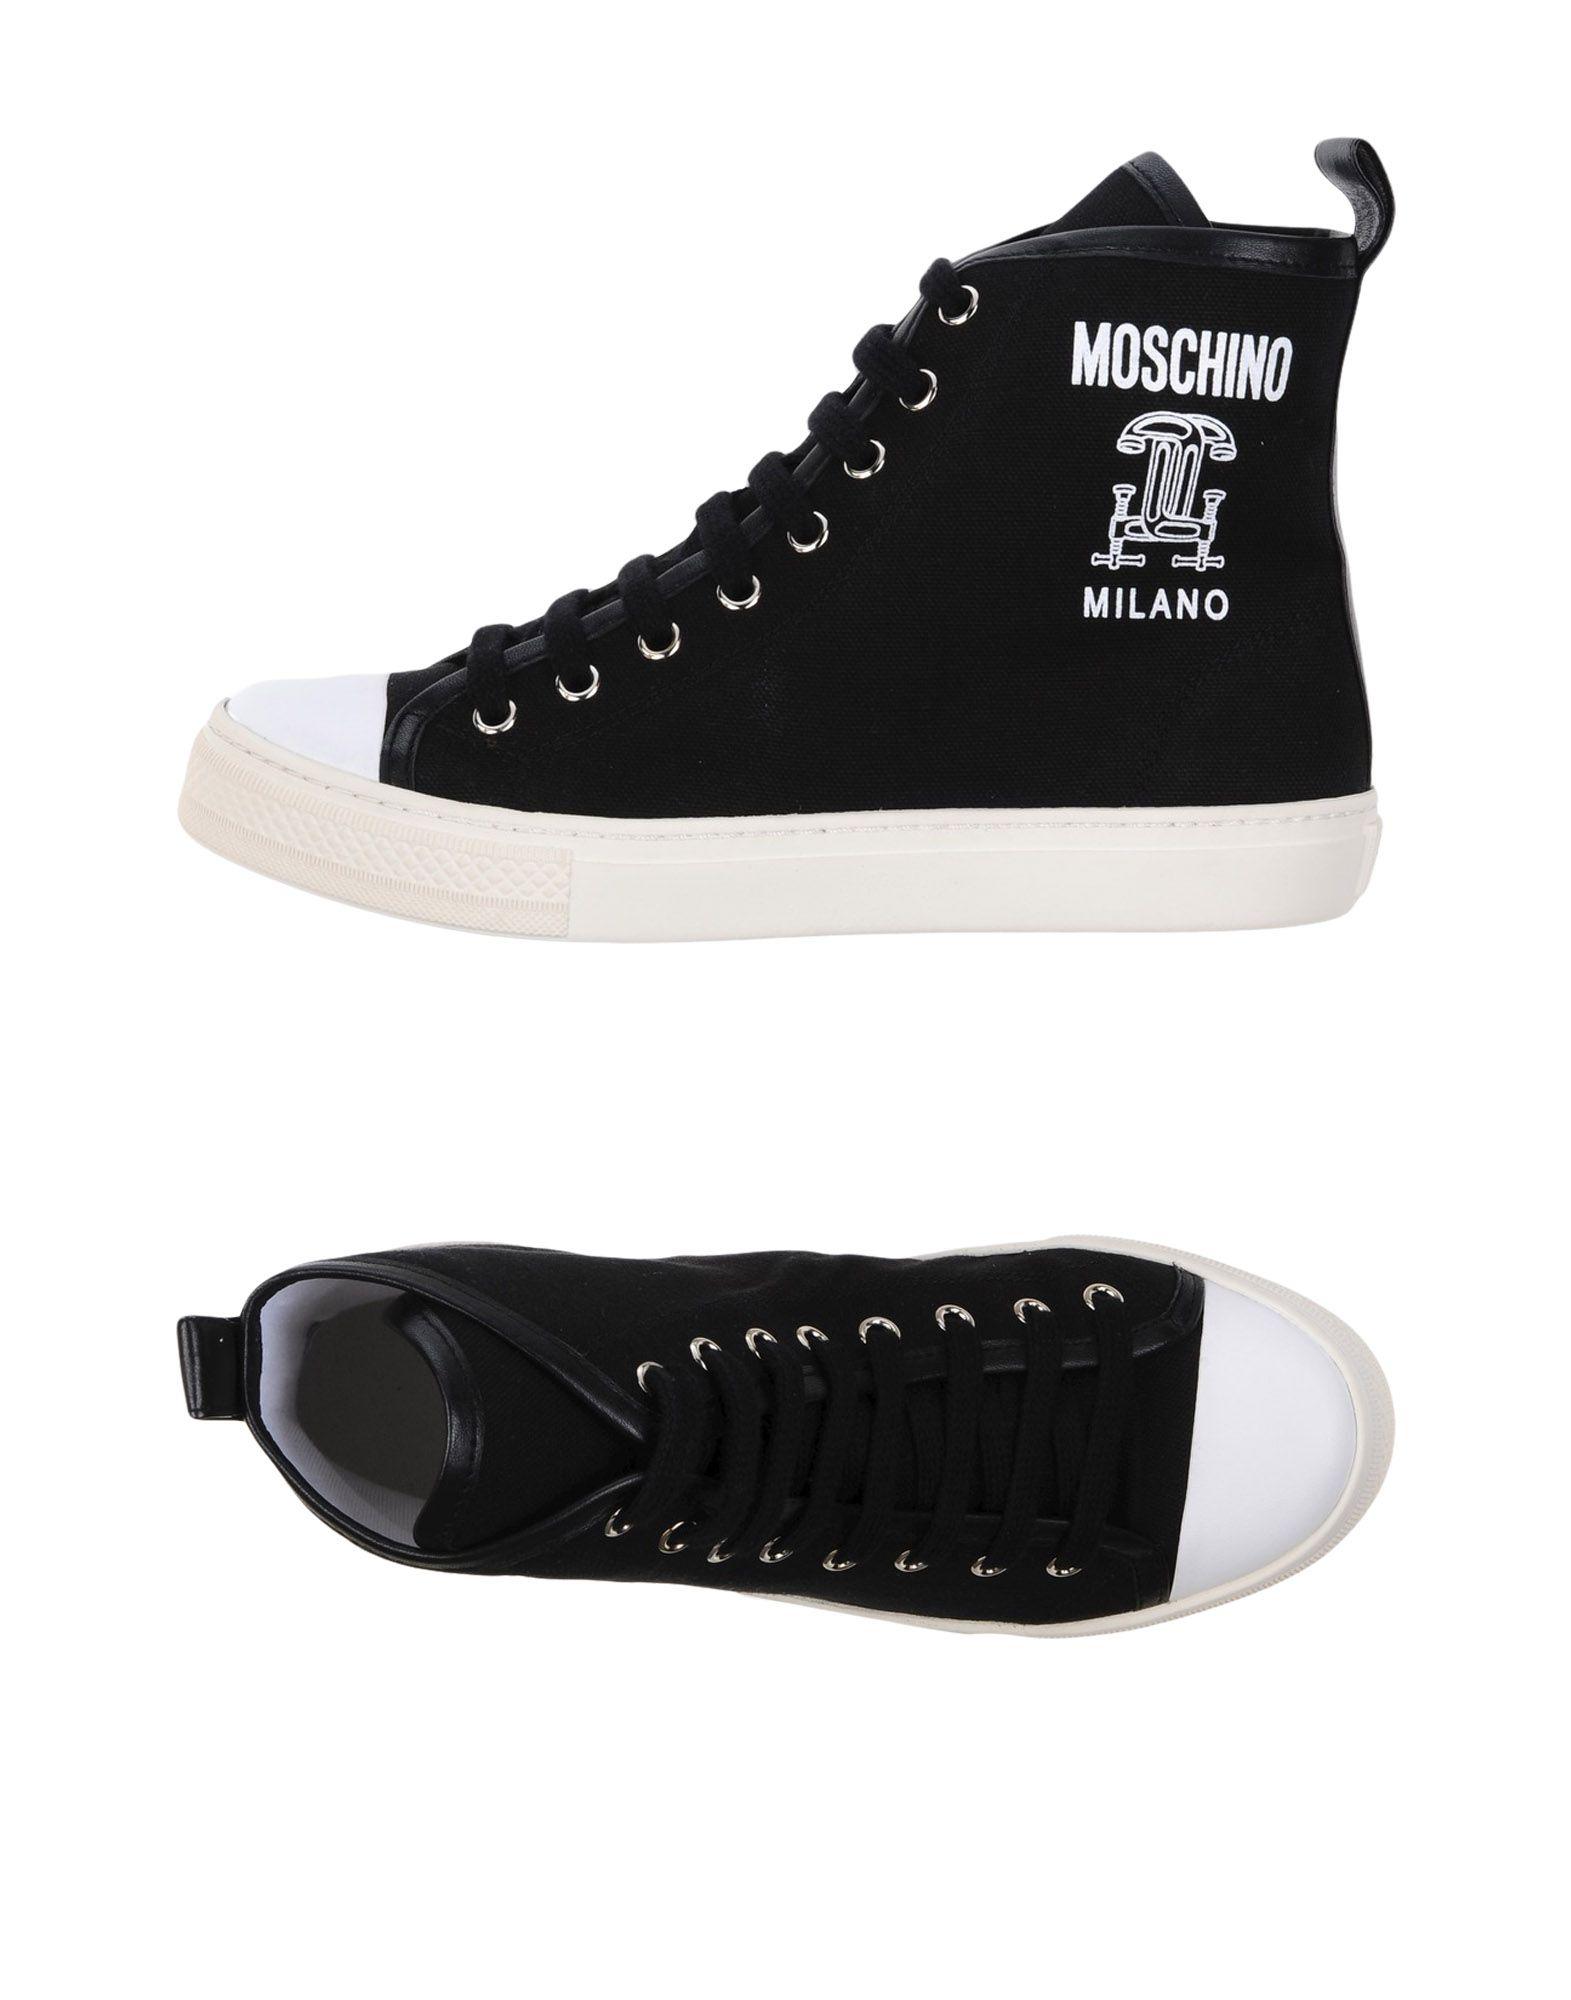 Stilvolle Damen billige Schuhe Moschino Sneakers Damen Stilvolle  11284303FV 52b1fb